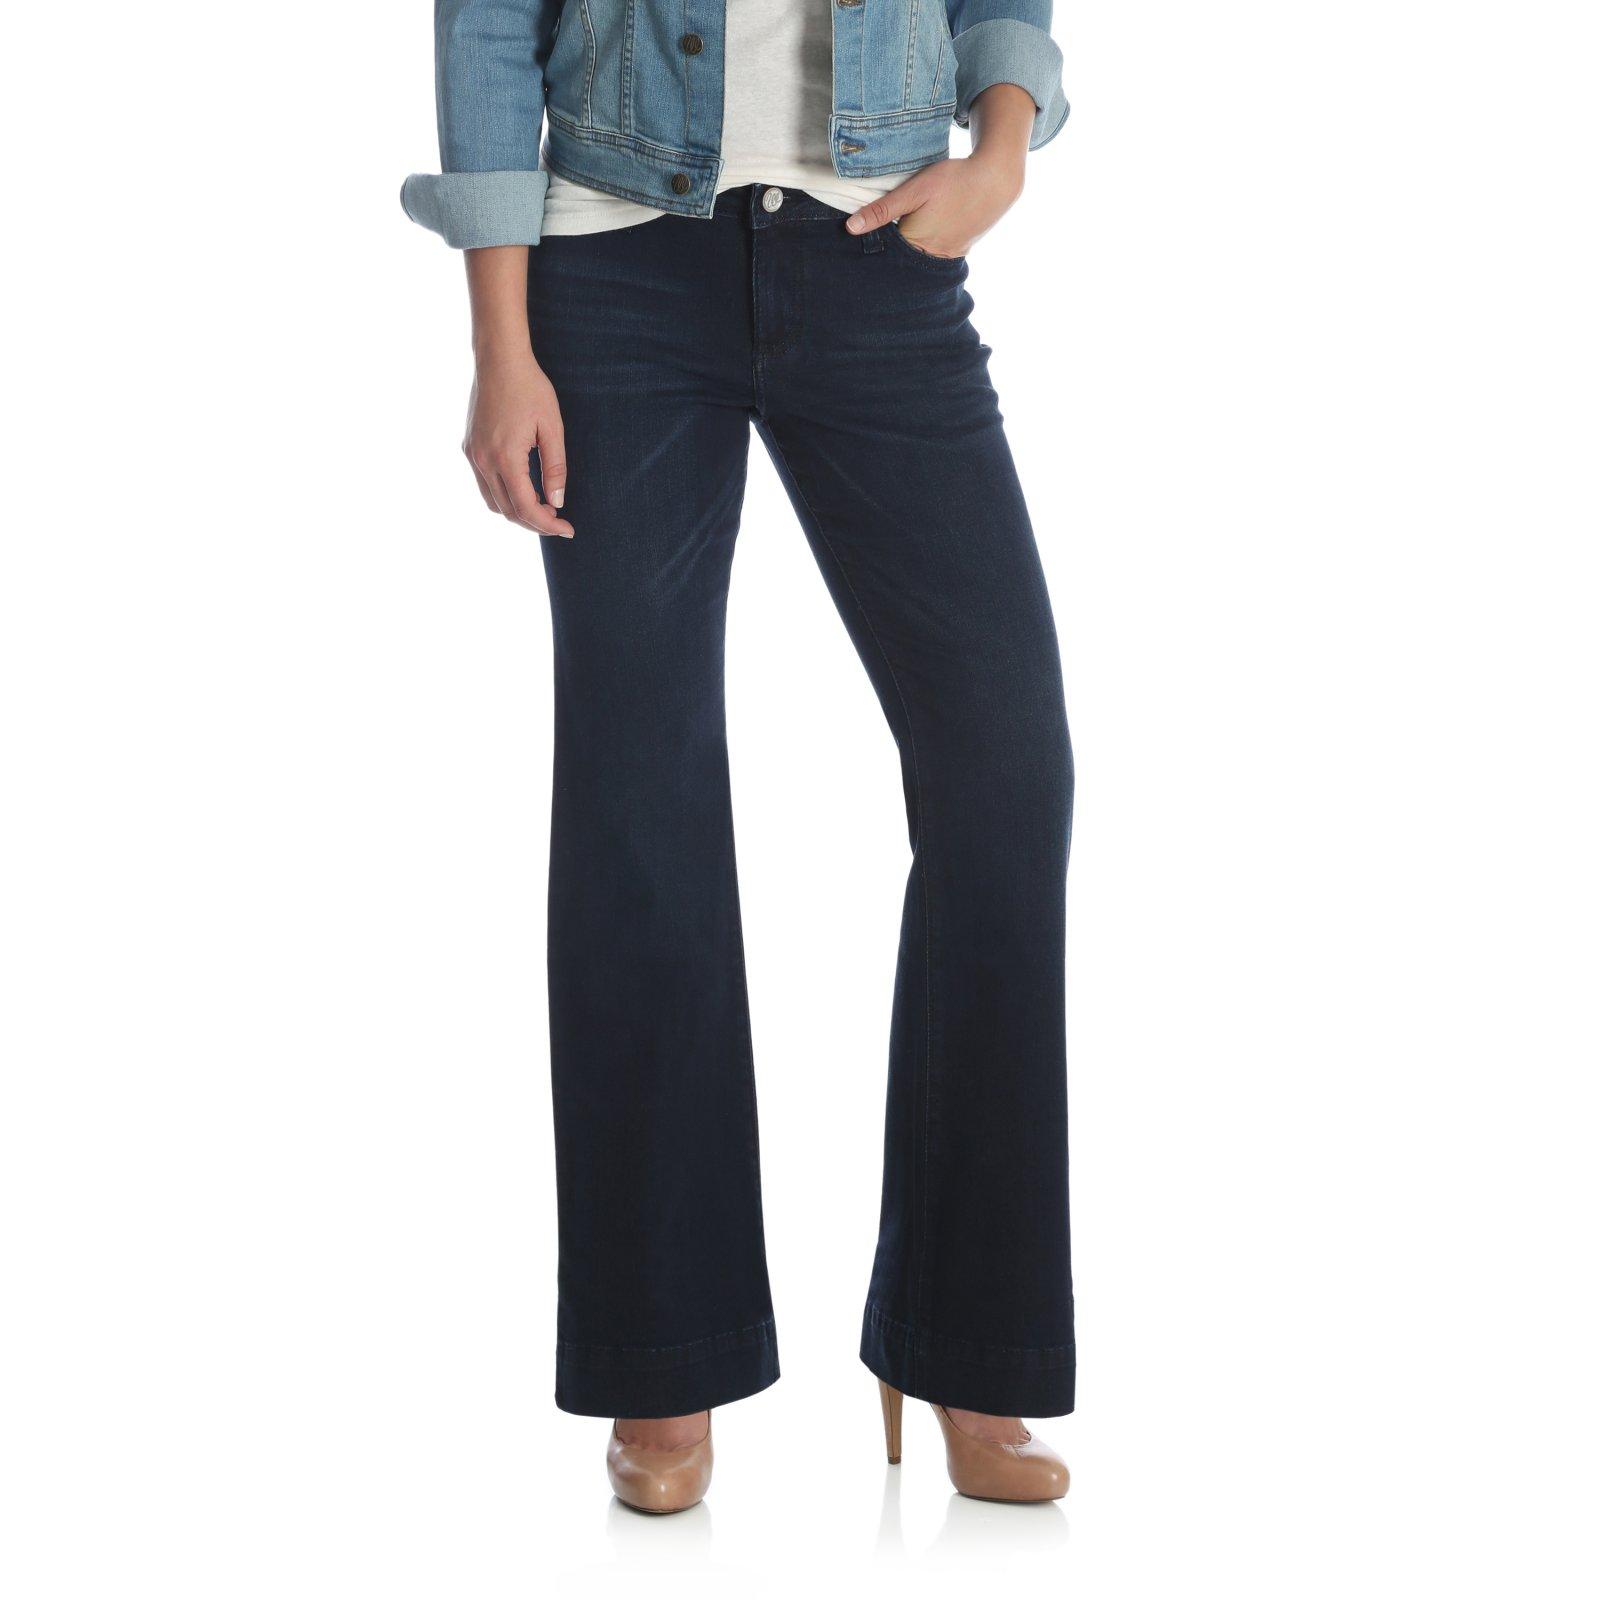 Ladies Retro Mae Trouser Jean from Wrangler